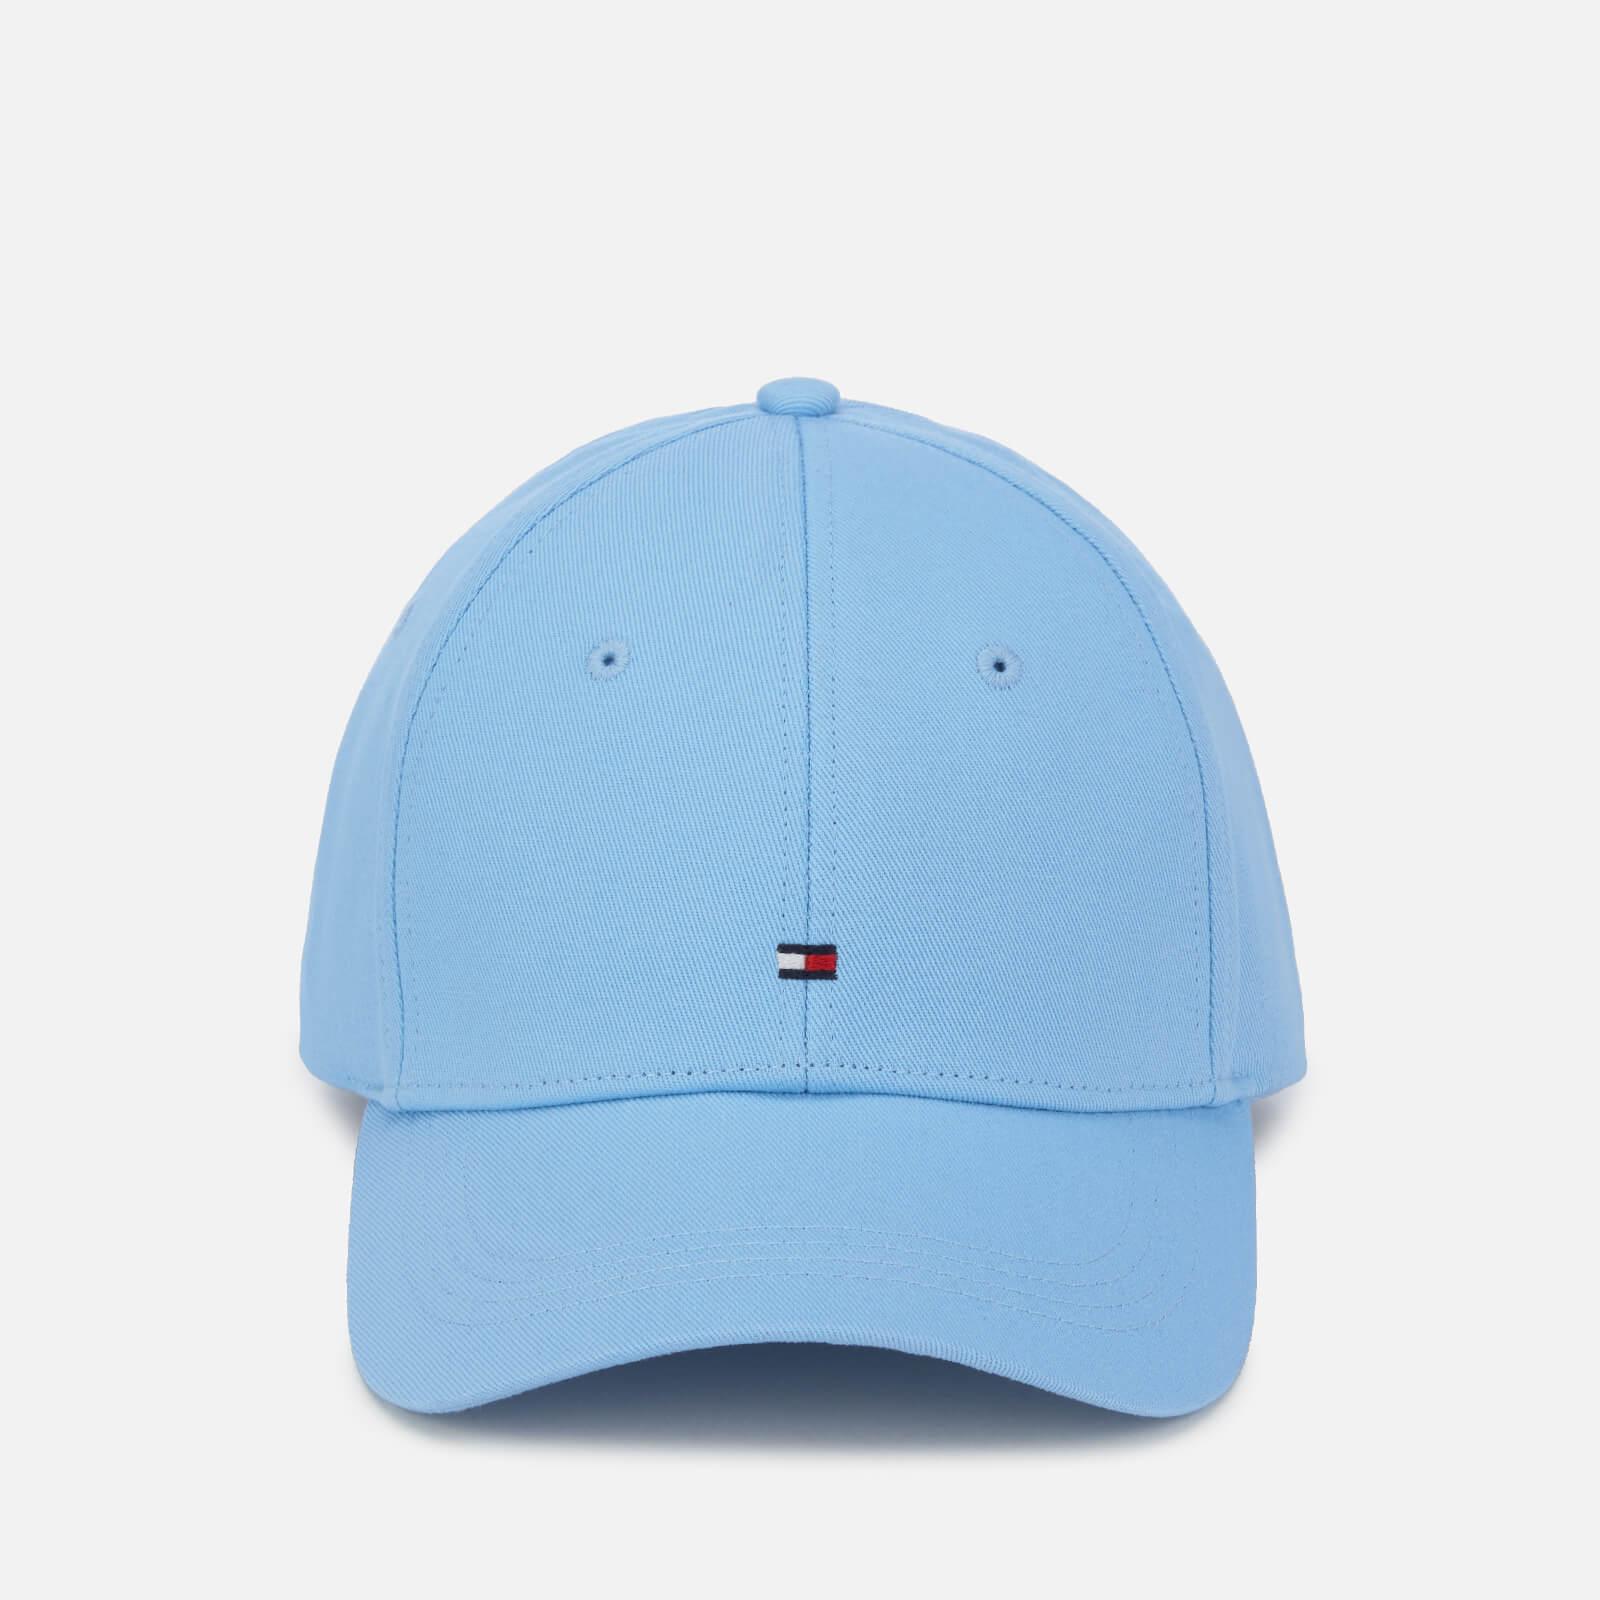 846615d2b76 Tommy Hilfiger Women s Classic BB Cap - Alaskan Blue Womens Accessories